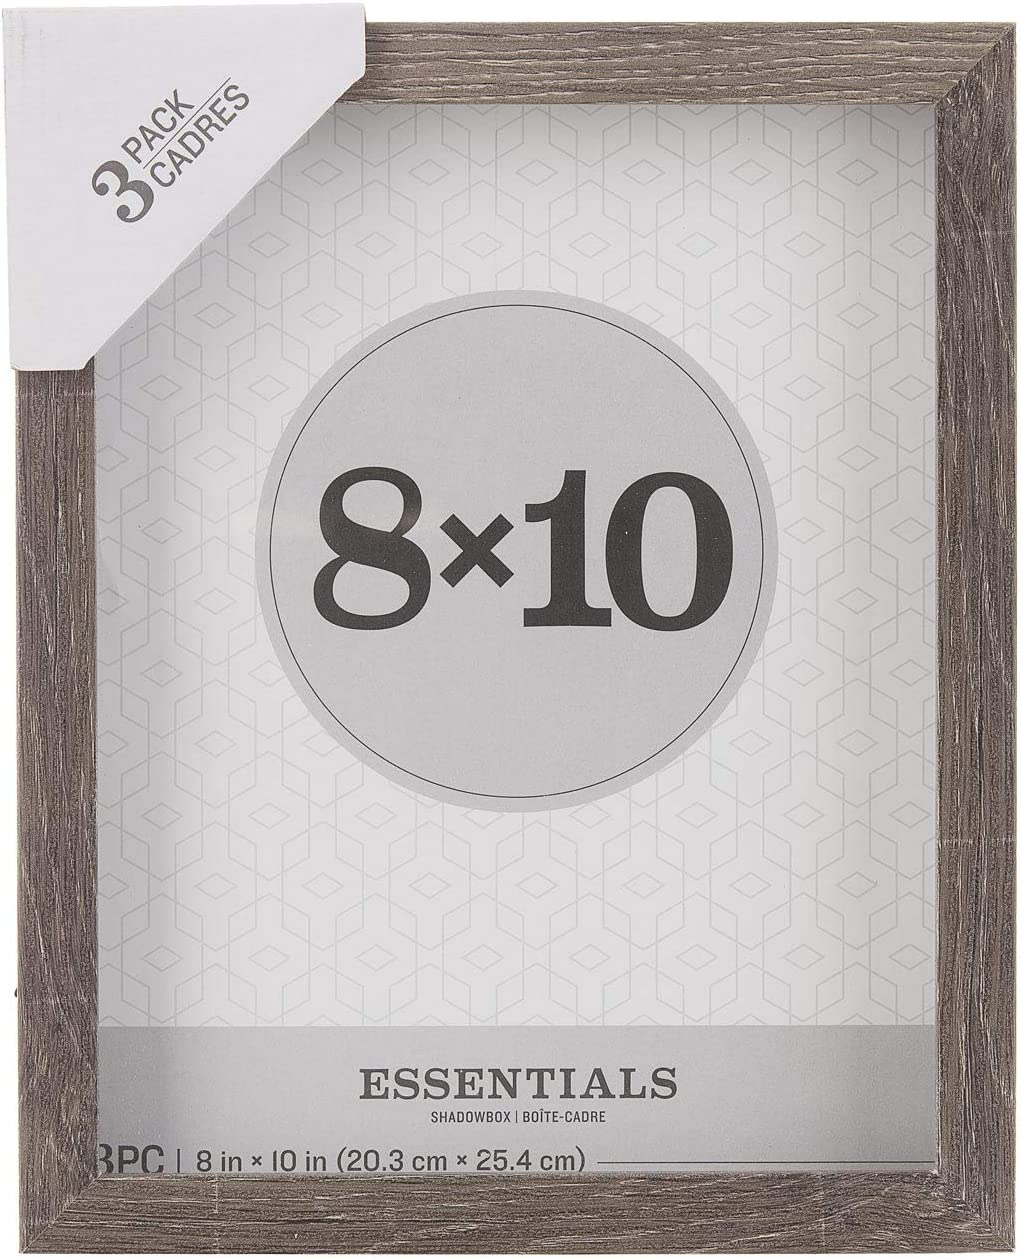 Darice Essentials Gray Shadow Box 3Piece 8 X 10